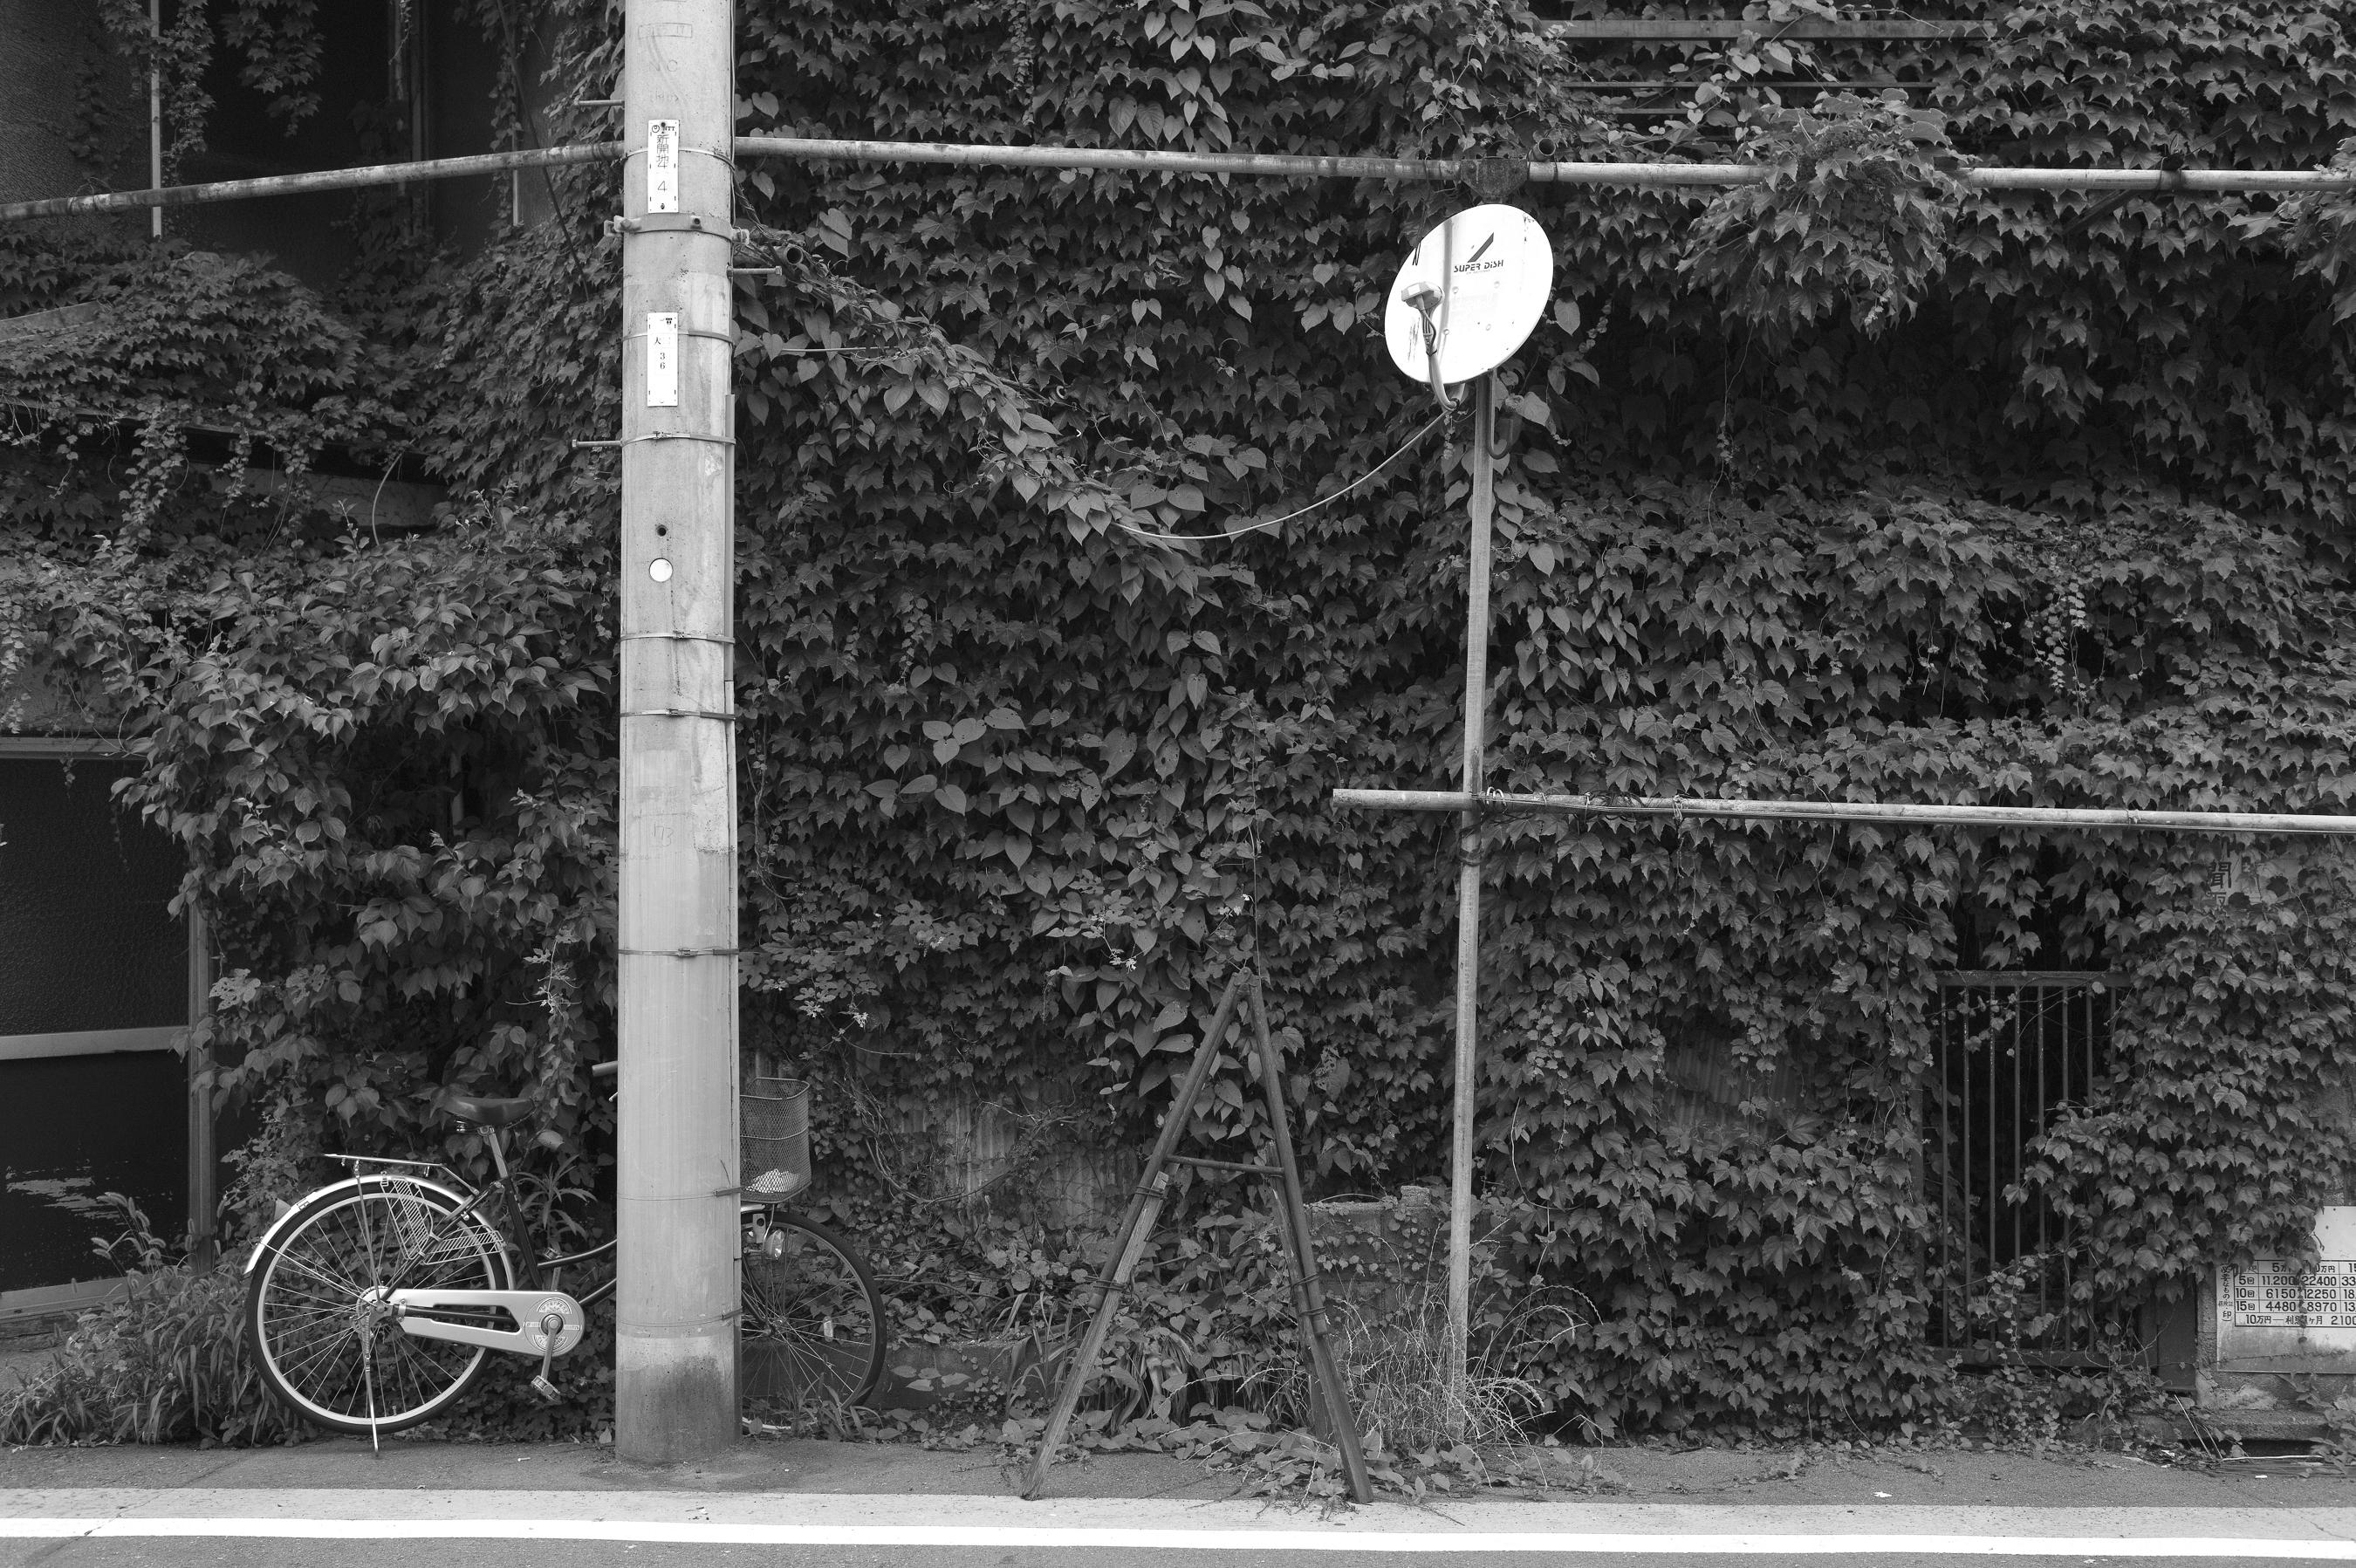 f:id:aoyama-takuro:20180808213957j:plain